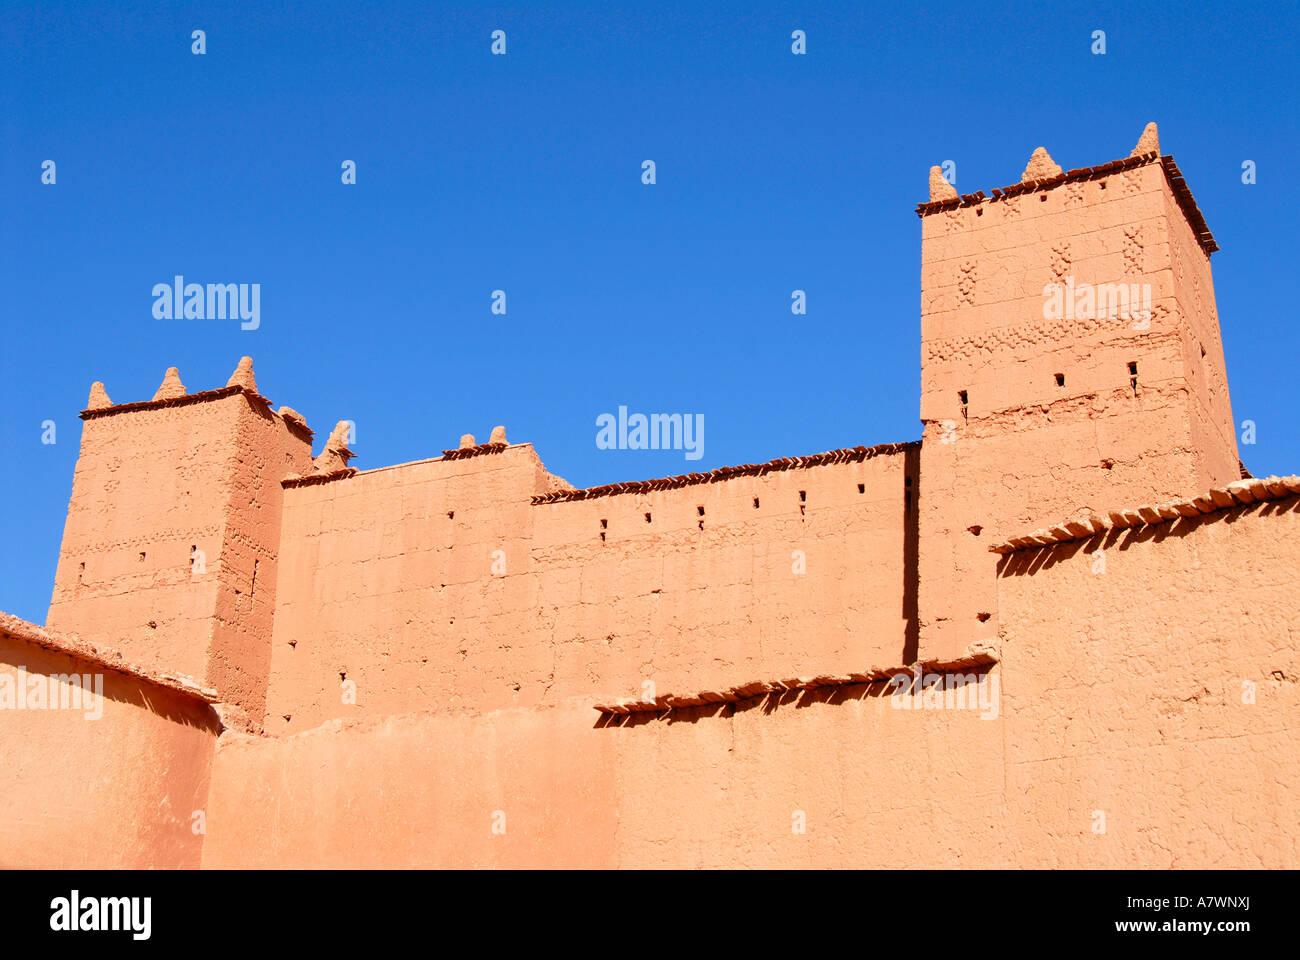 Reddish walls made of clay ksar kasbah Ait-Youl Morocco - Stock Image